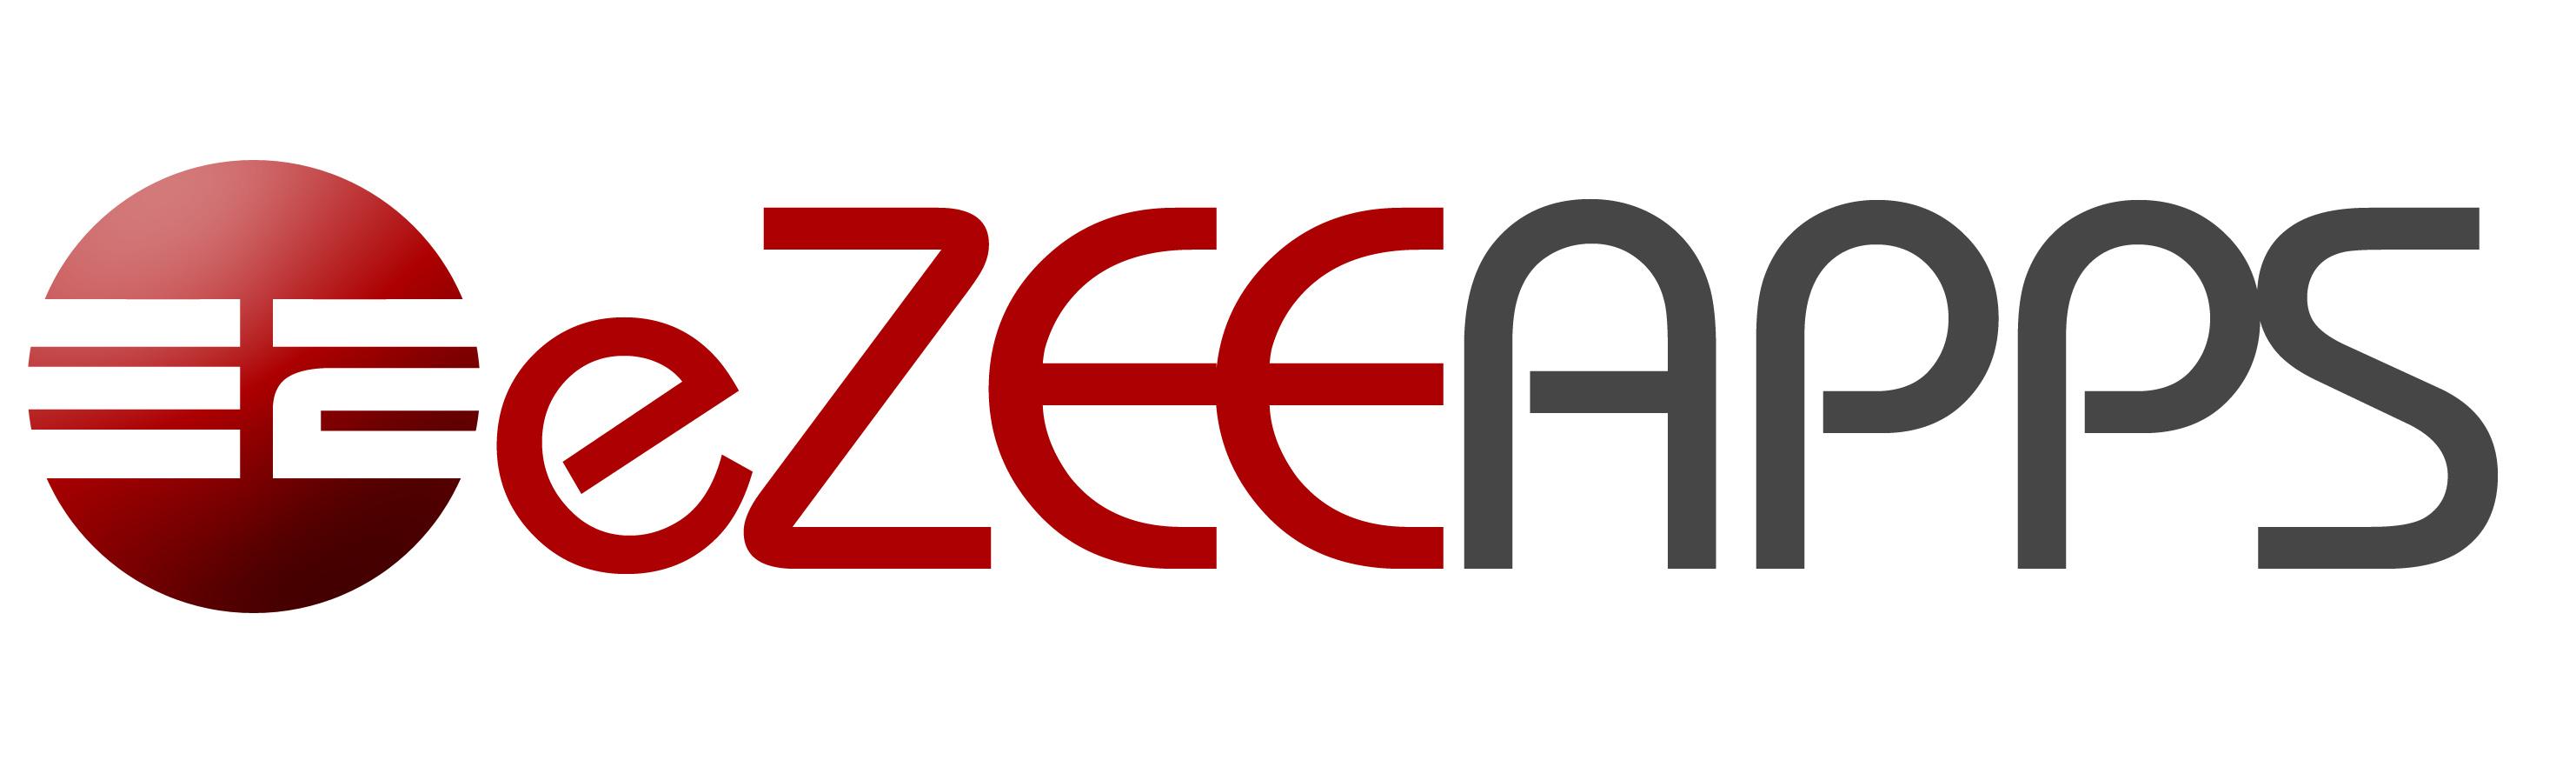 Ezee Apps Logo